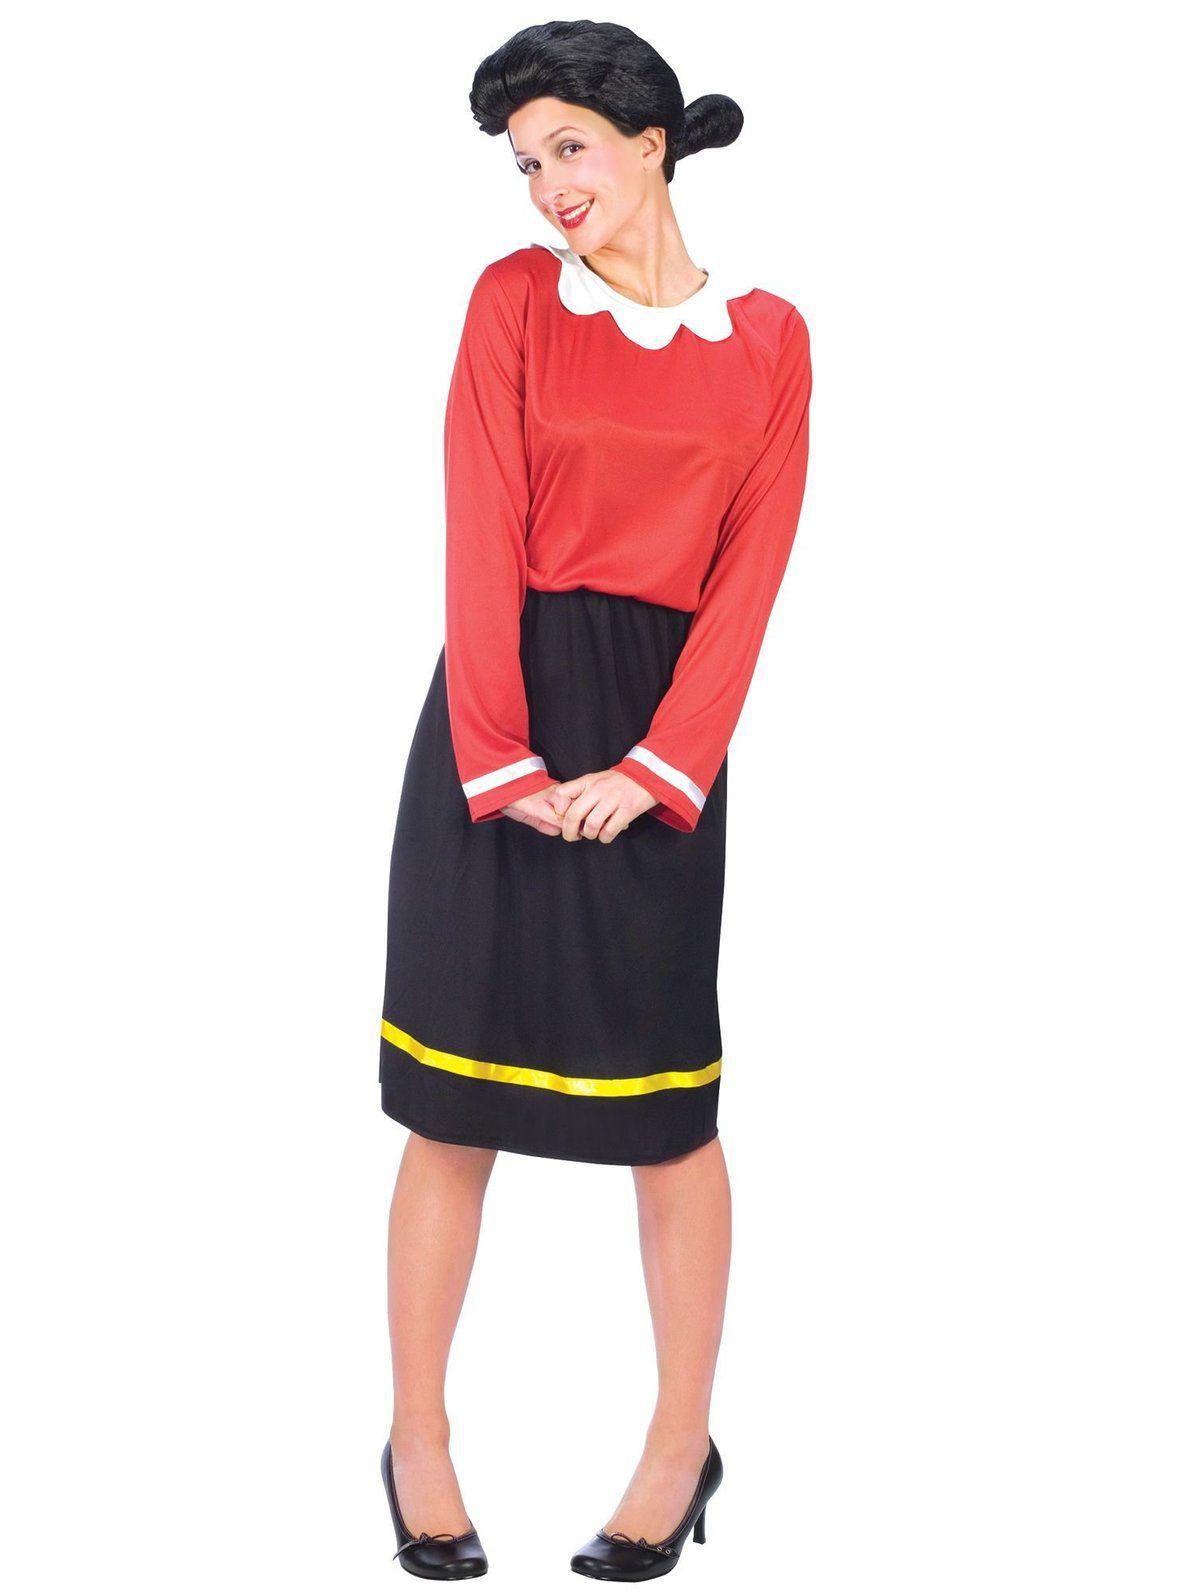 Women Olive Oyl Popeye Halloween Fancy Dress Costume Halloween Party Outfits